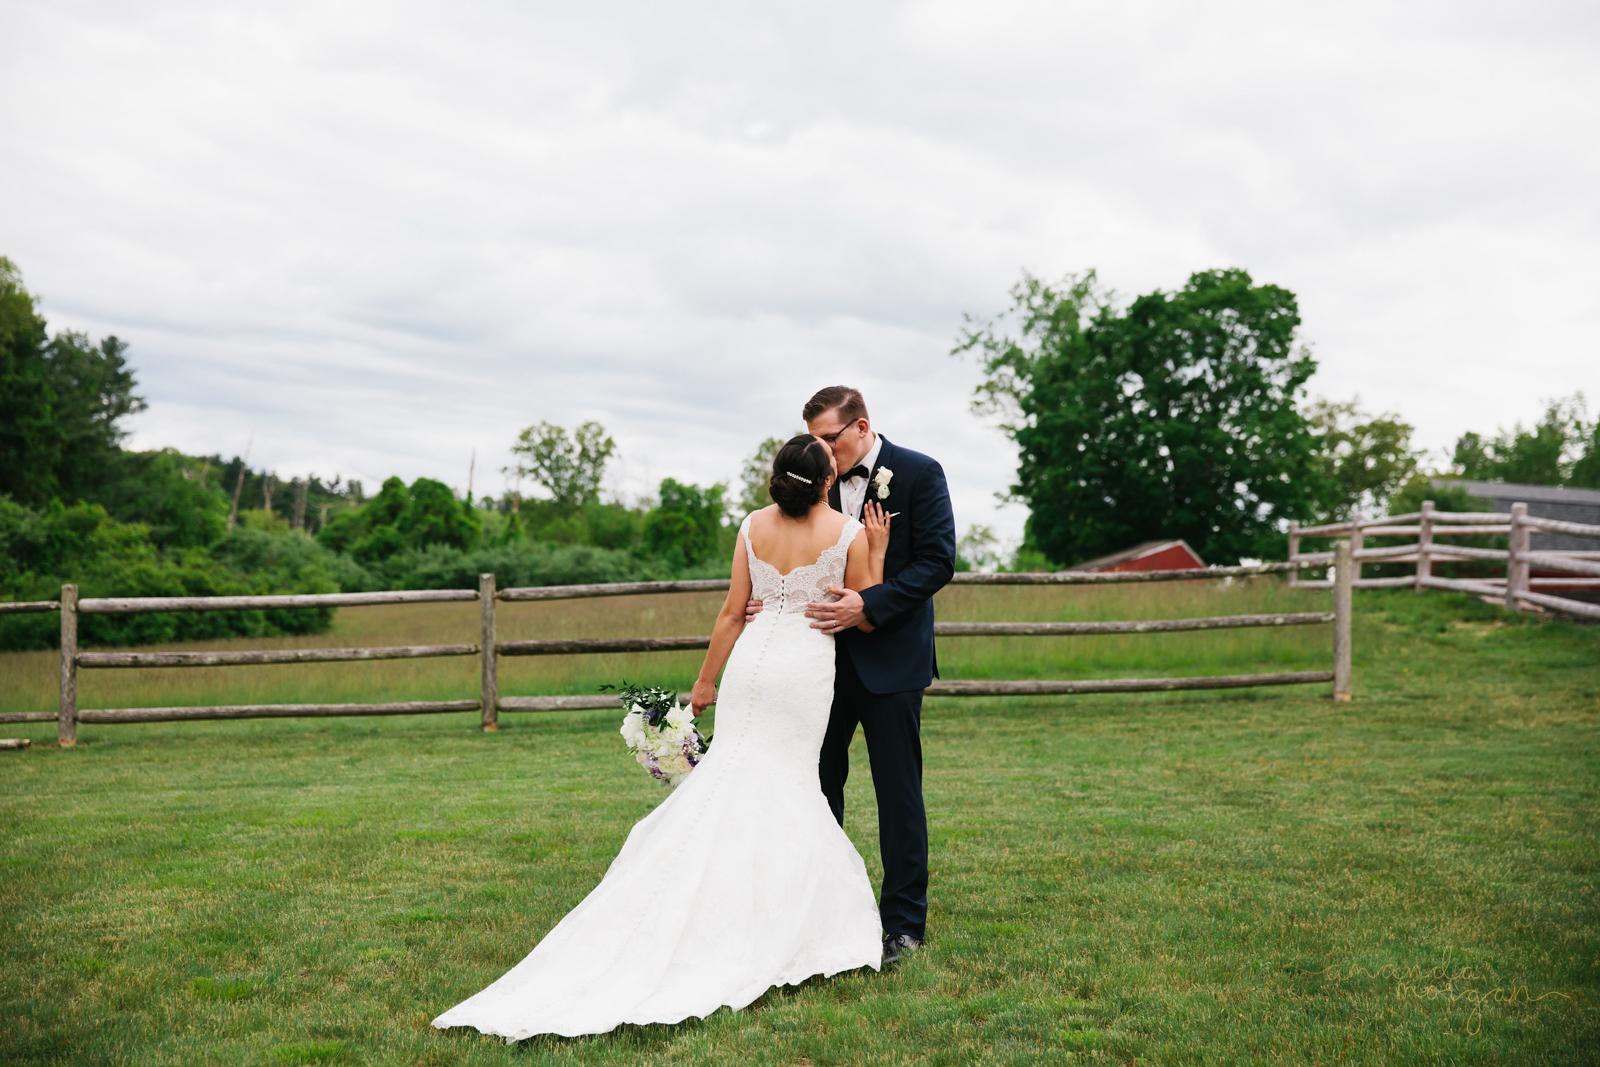 Publick-House-Wedding-Amanda-Morgan-31.jpg